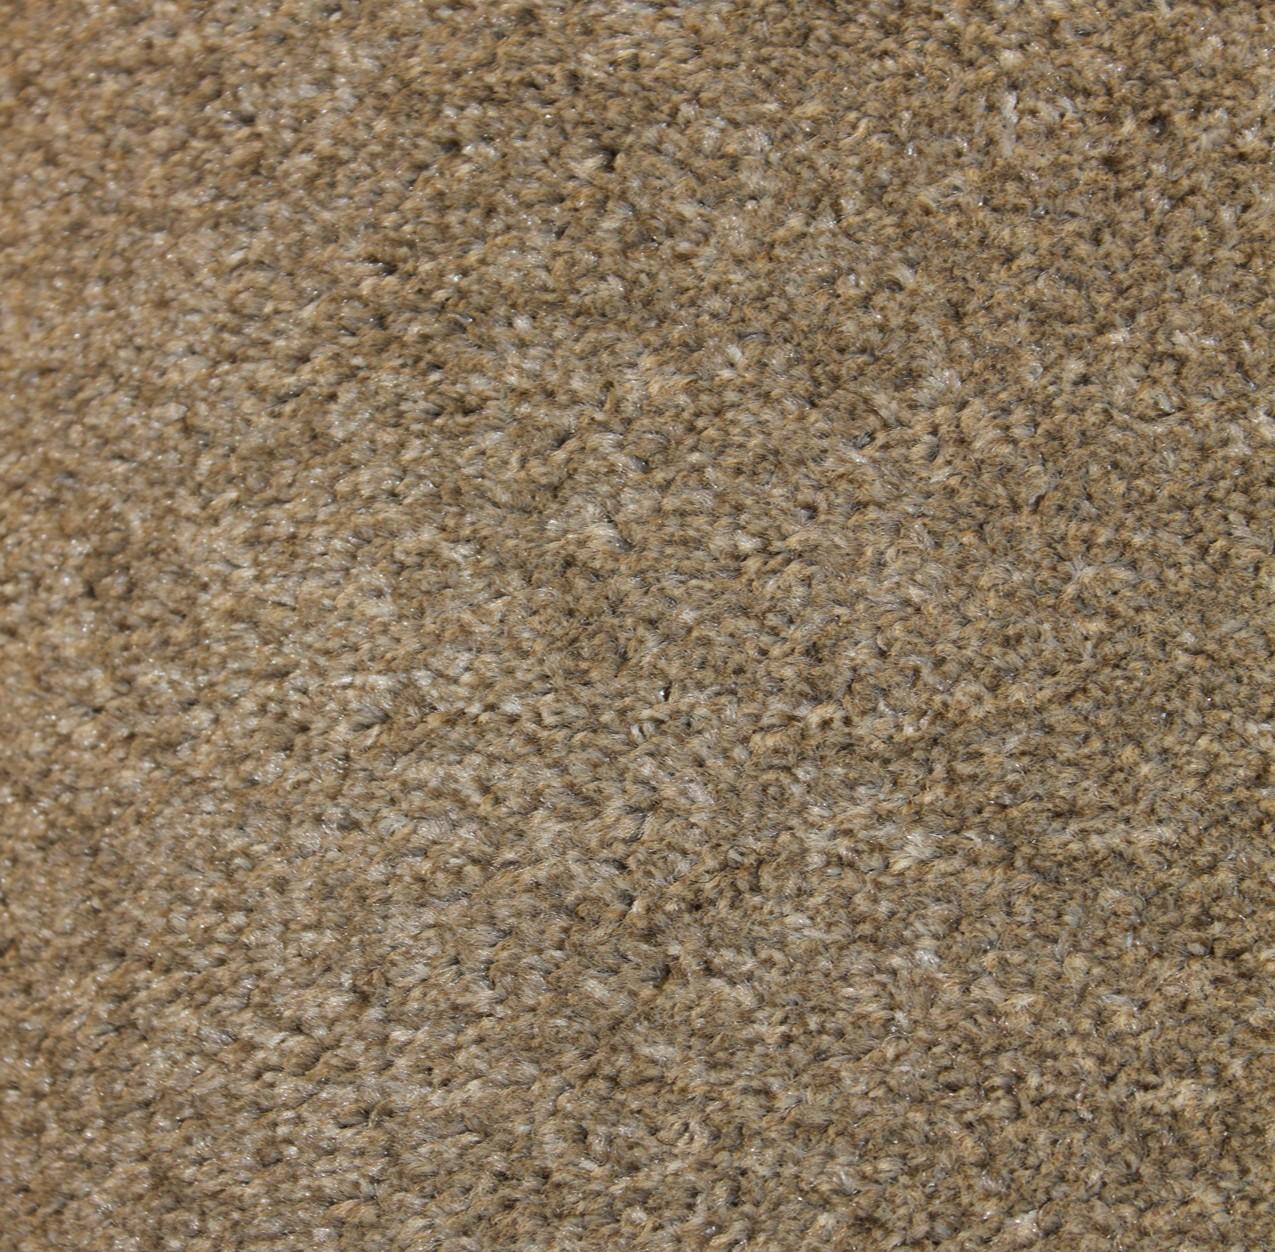 Carpet Archives  Carpet Fitter and Floor Layer Nottingham